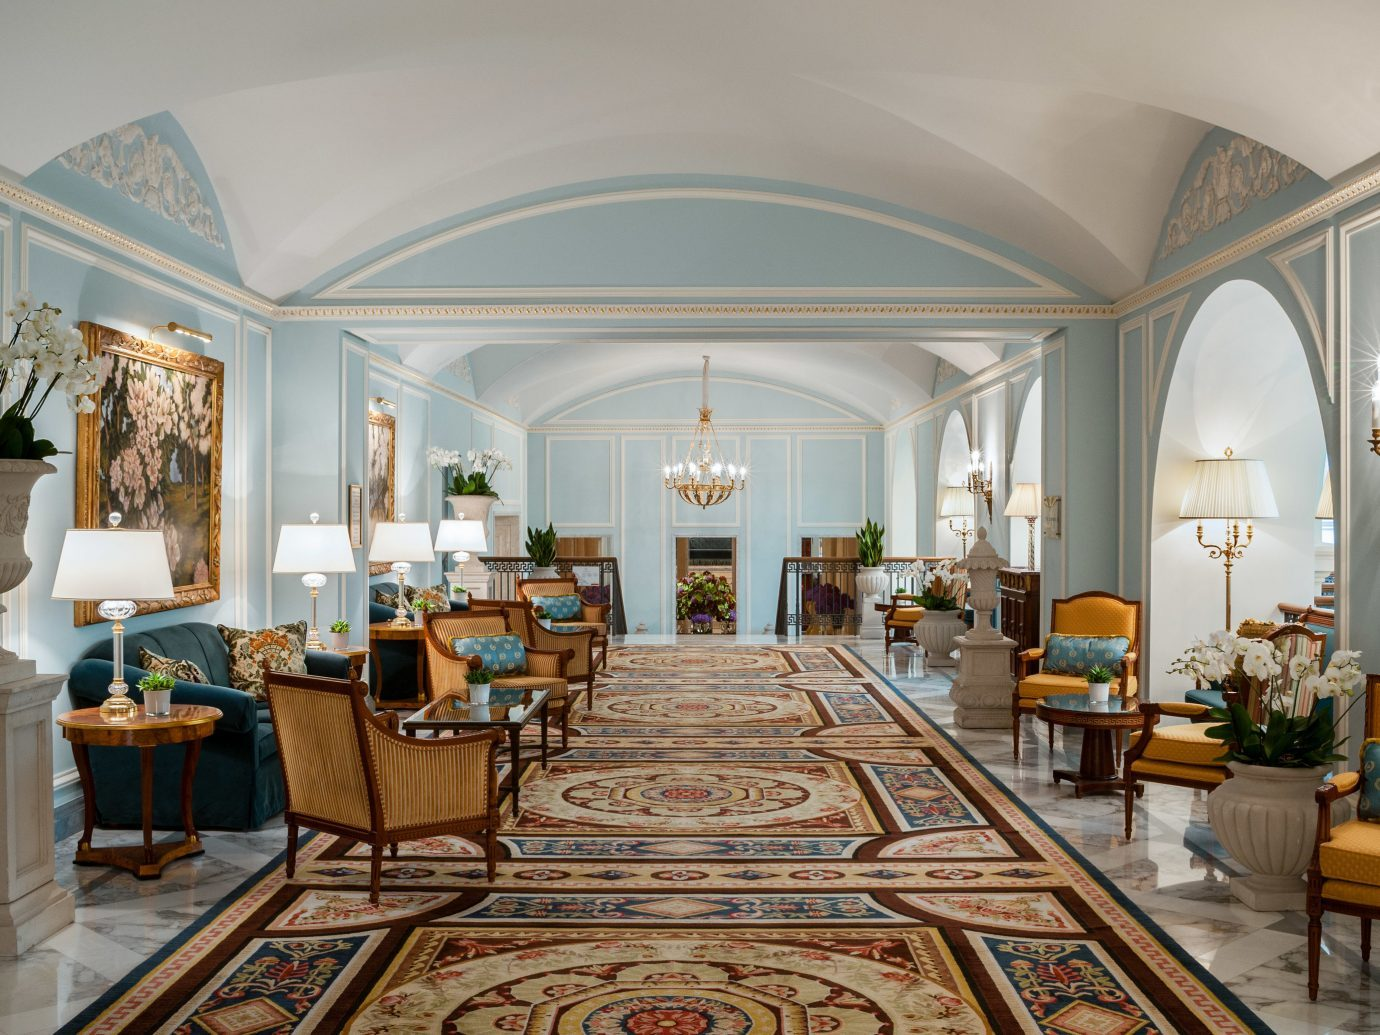 Four Seasons Lion Palace St. Petersburg